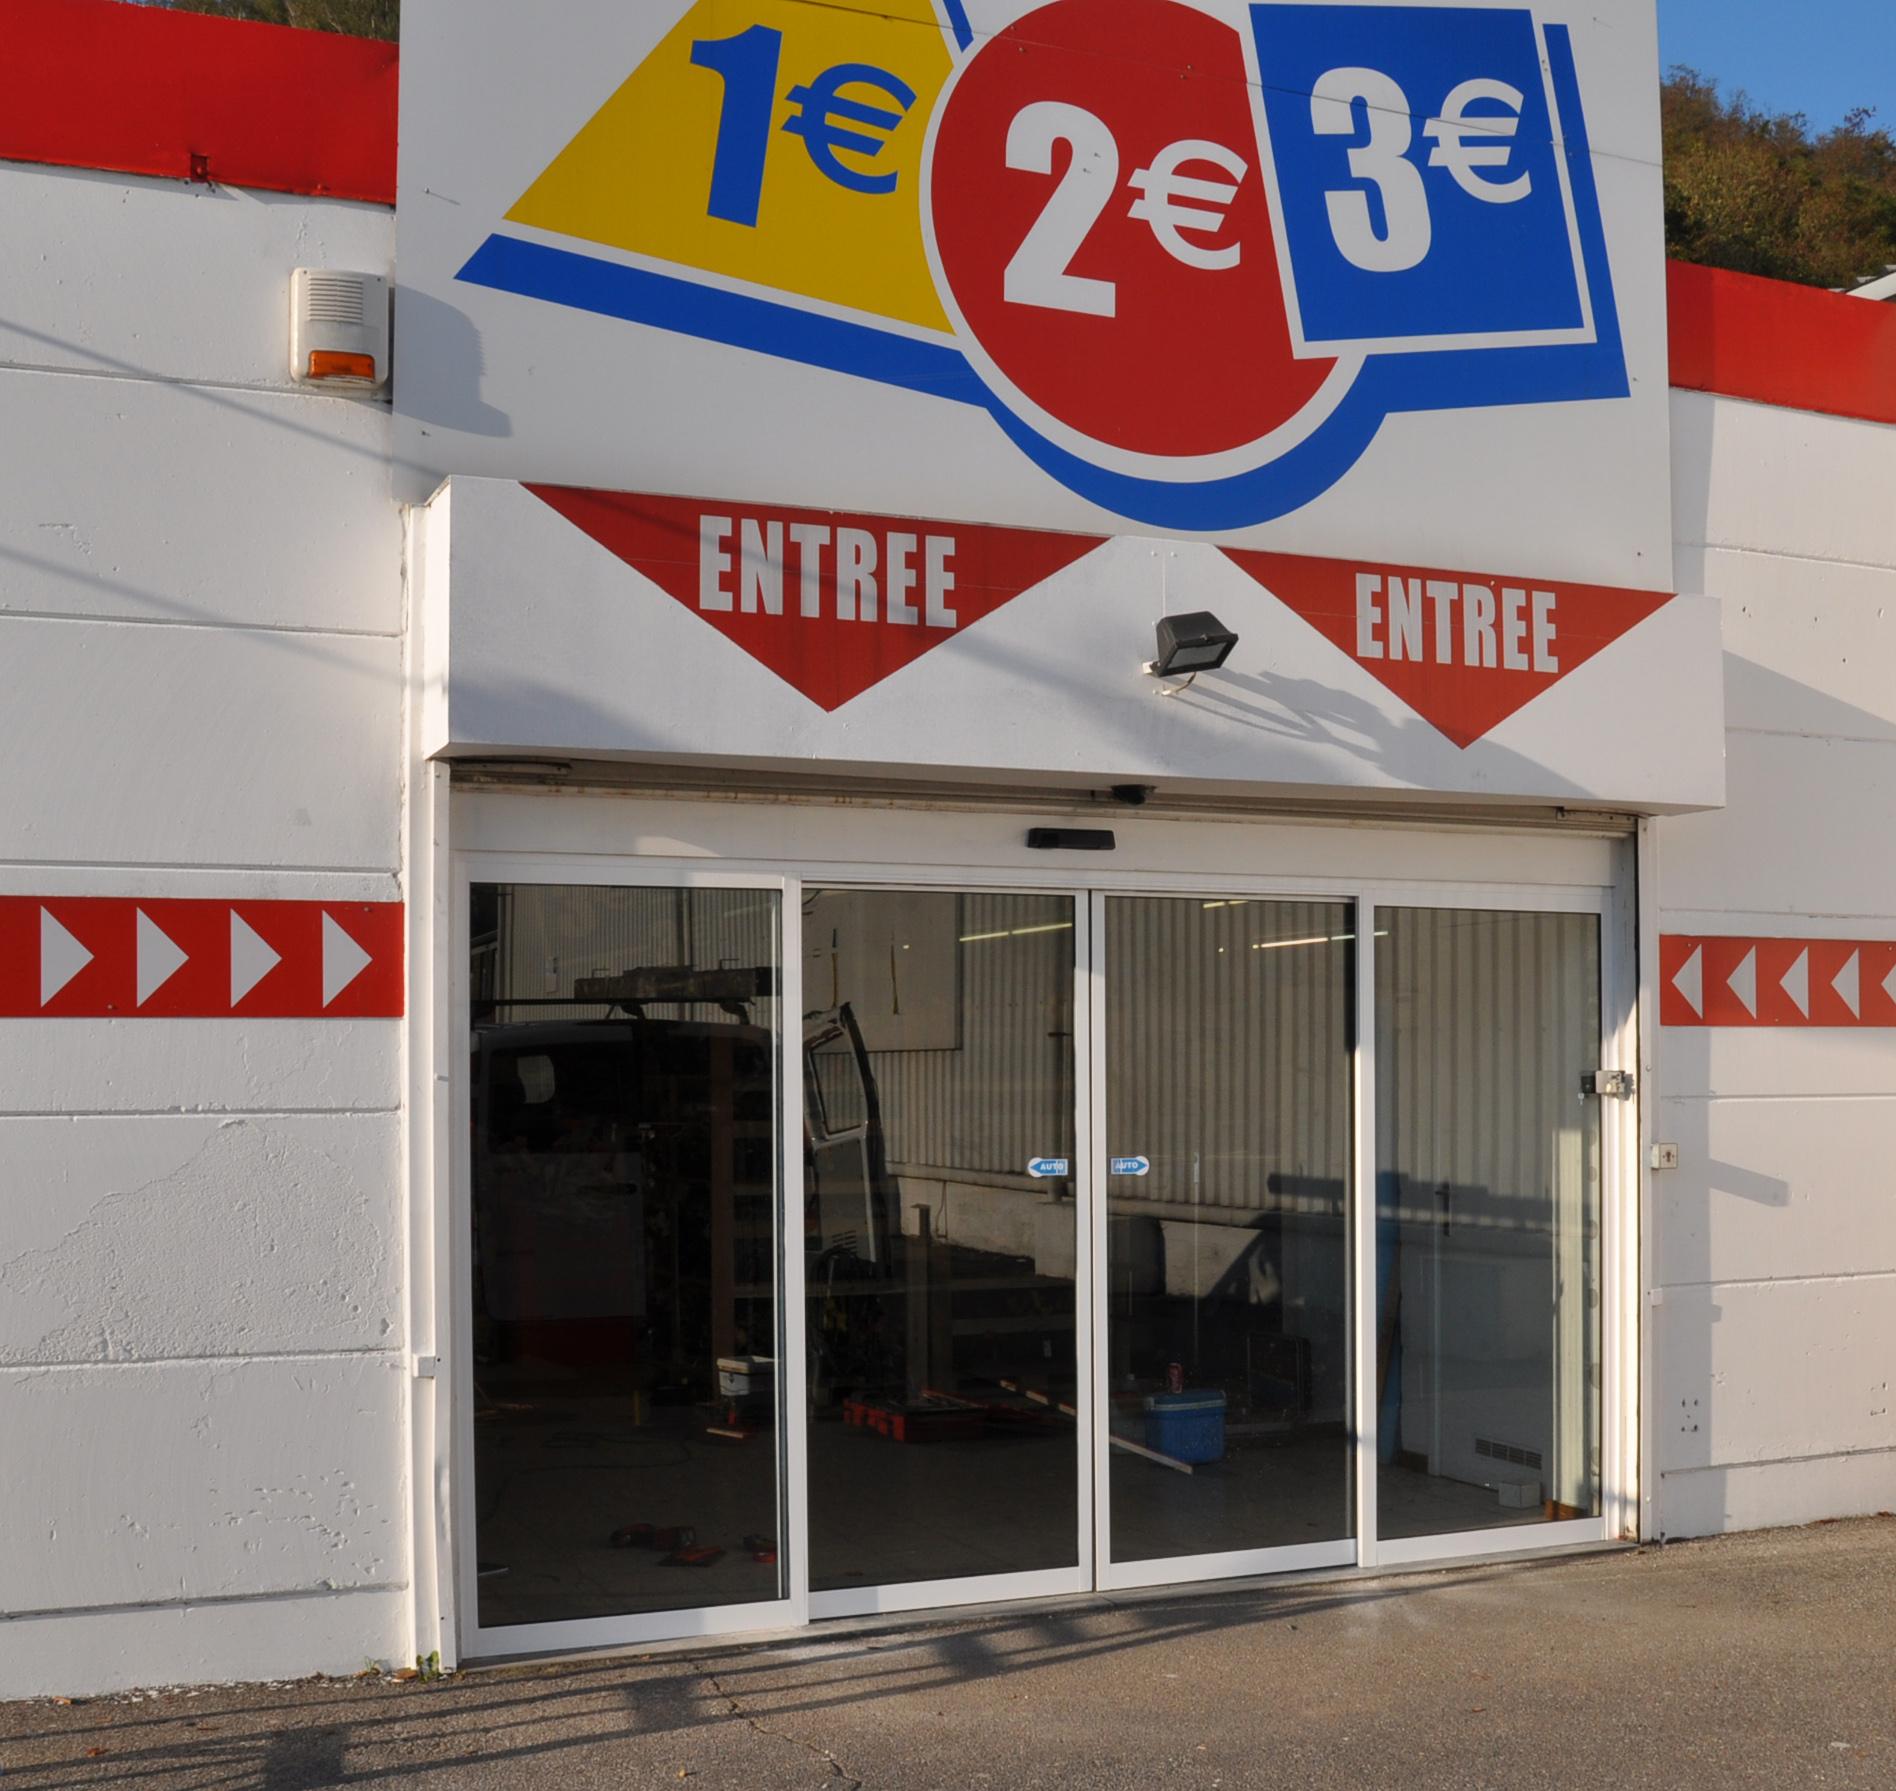 123€2 herstal